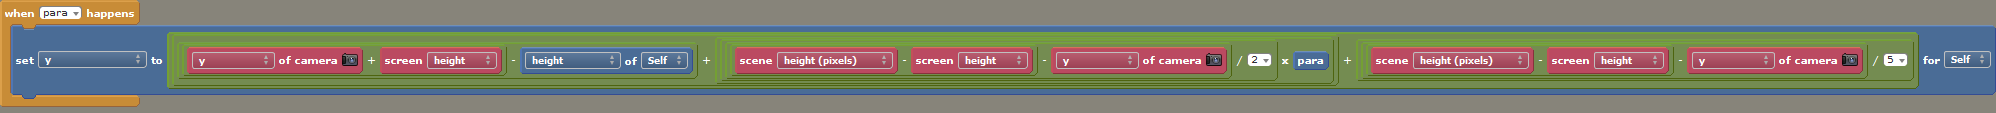 Stencyl Haxe Code - Vertical Parallax